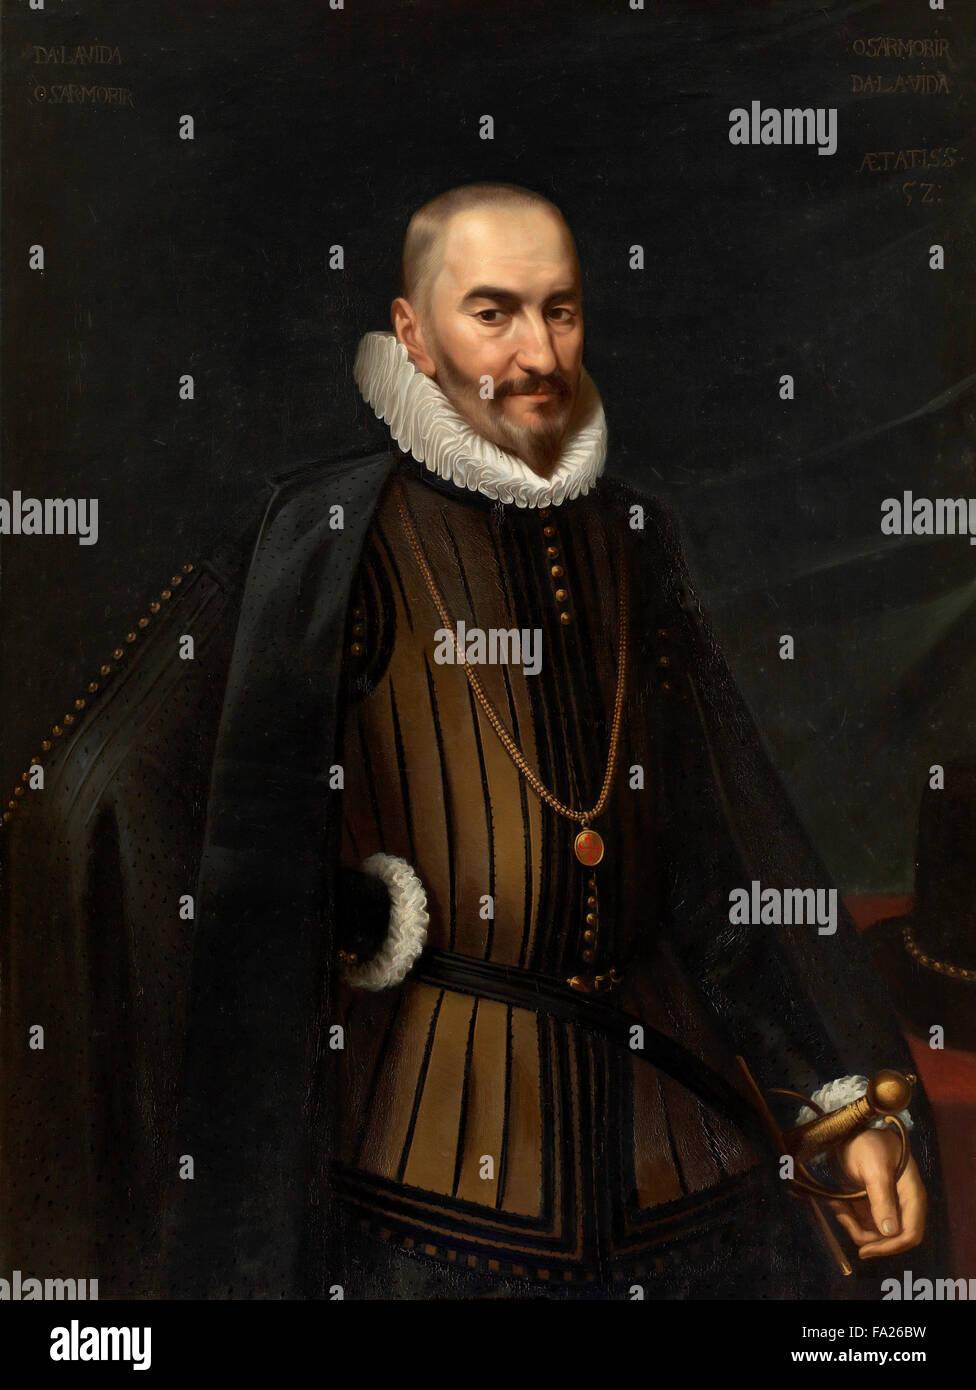 Don Diego Sarmiento de Acuña, Count of Gondomar, Spanish diplomat, the Spanish ambassador to England in 1613 - Stock Image